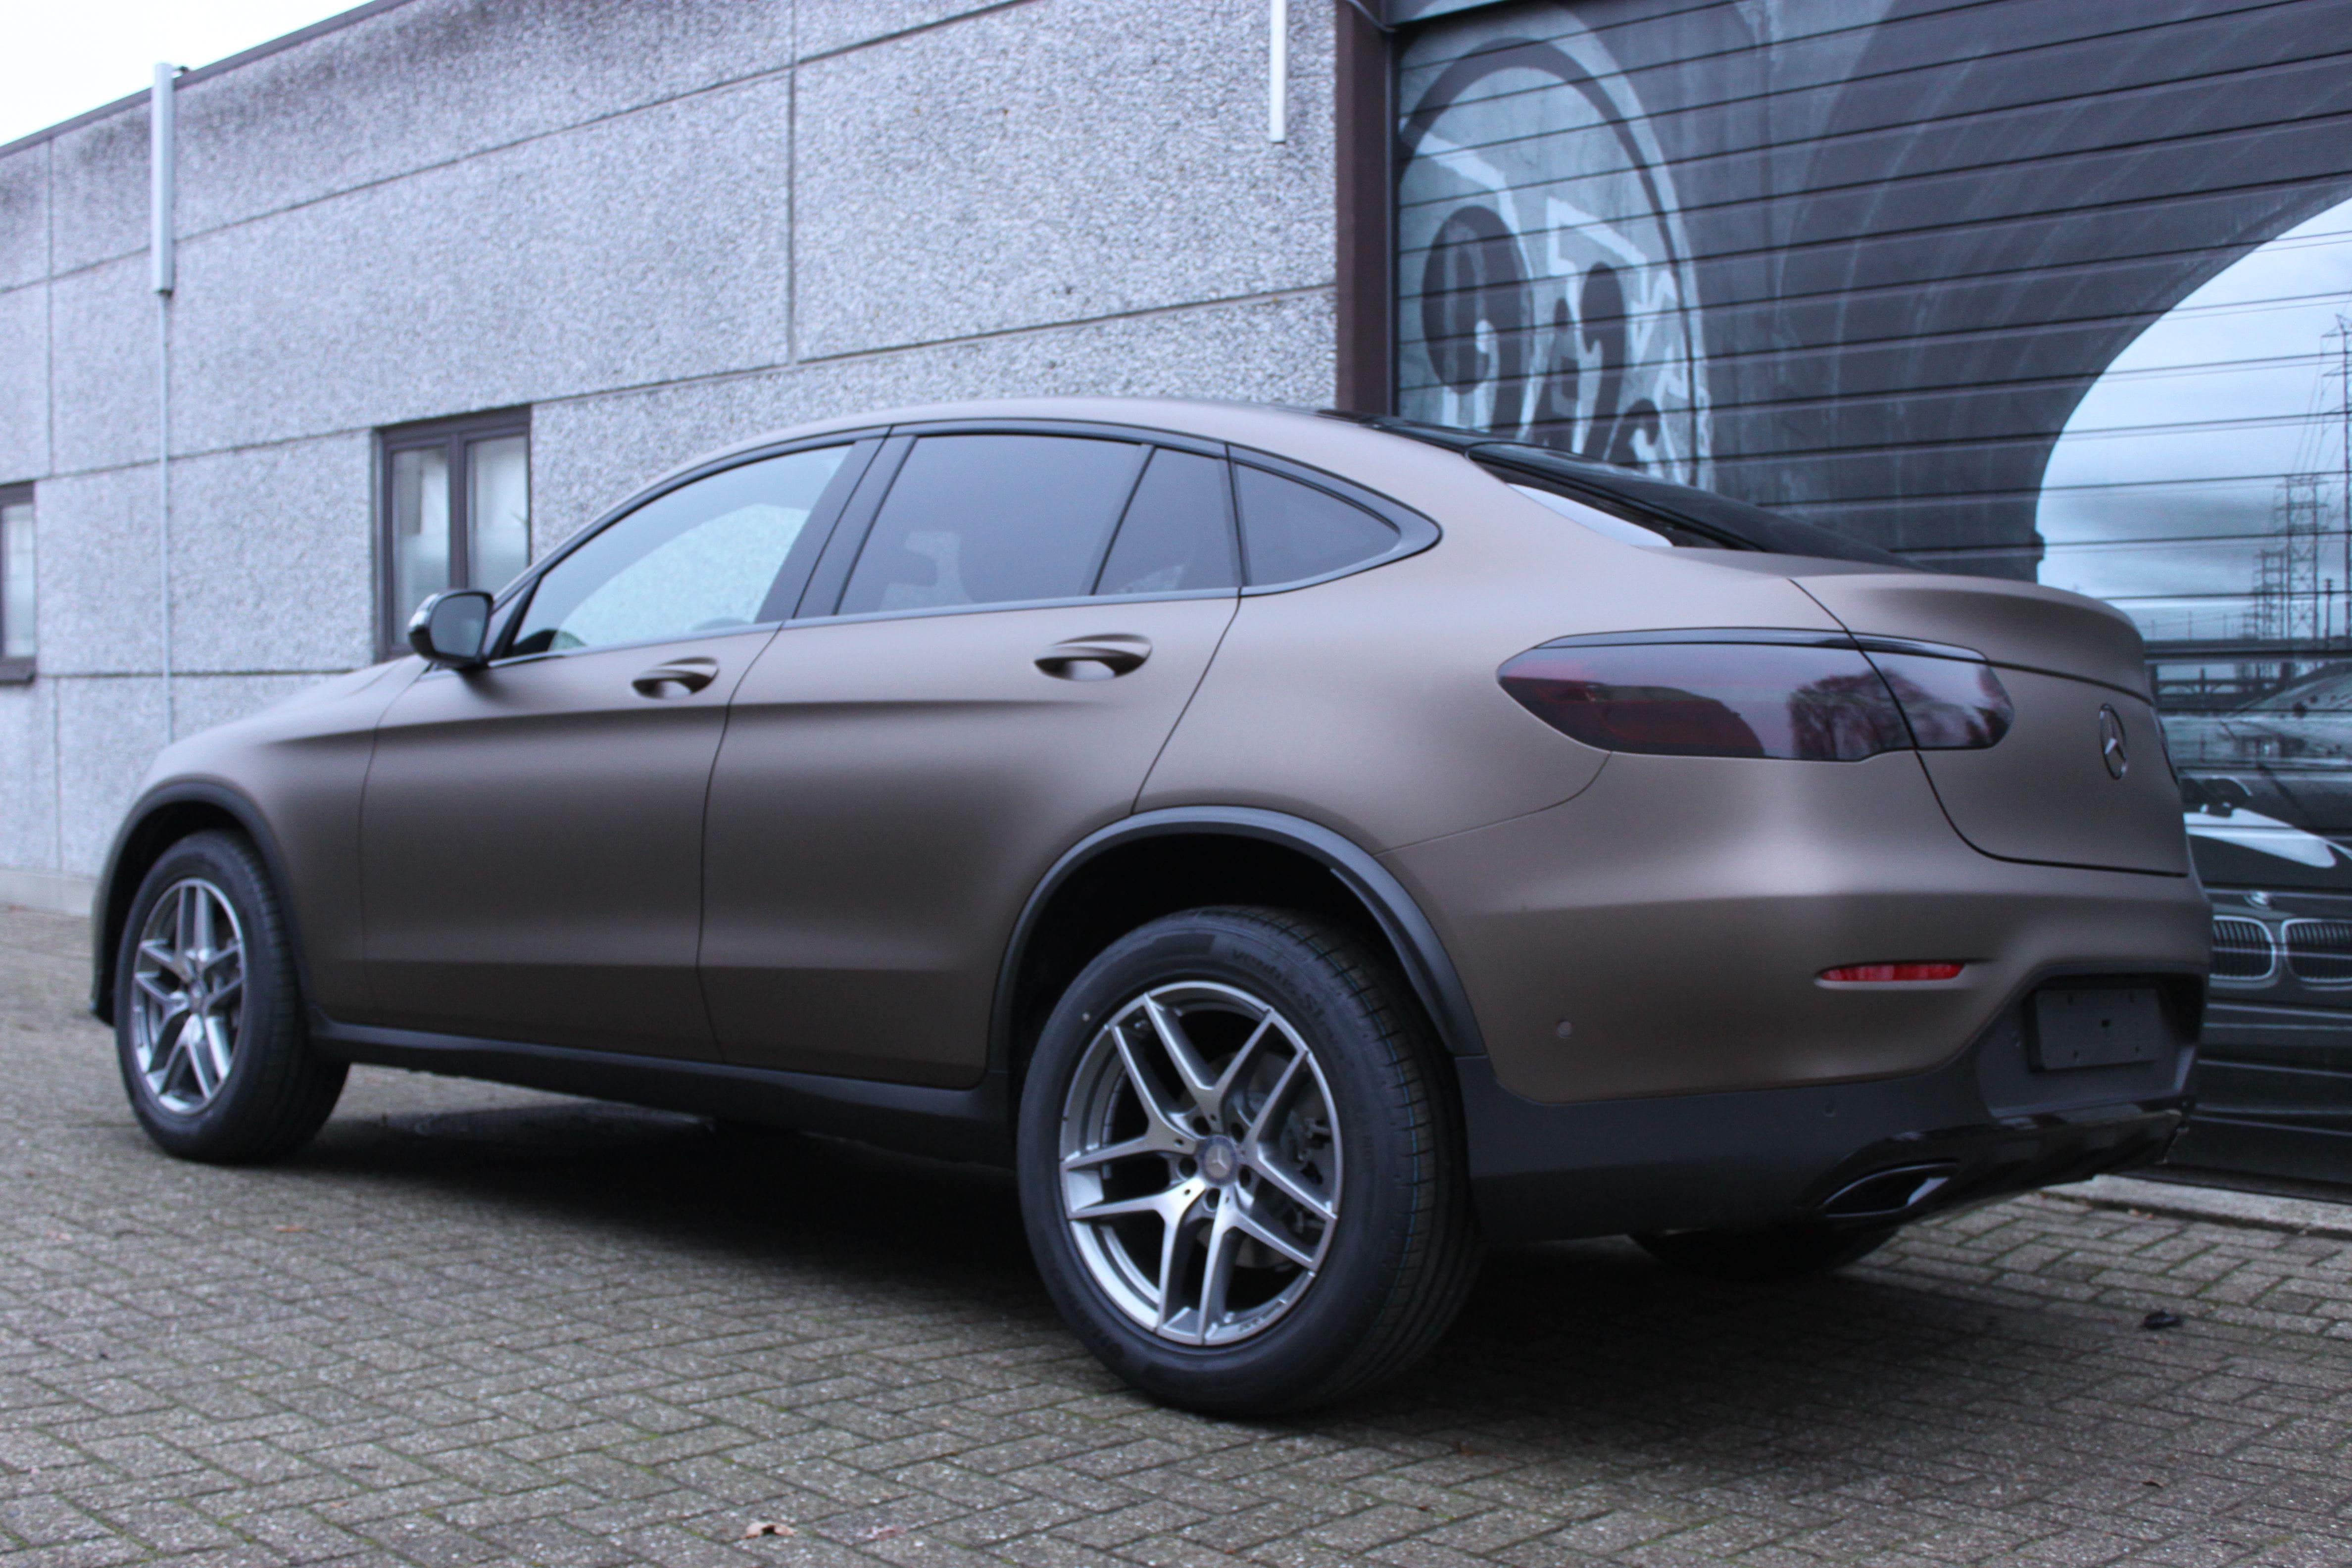 Mercedes GLC Coupe Matte metallic brown, Carwrapping door Wrapmyride.nu Foto-nr:9363, ©2021